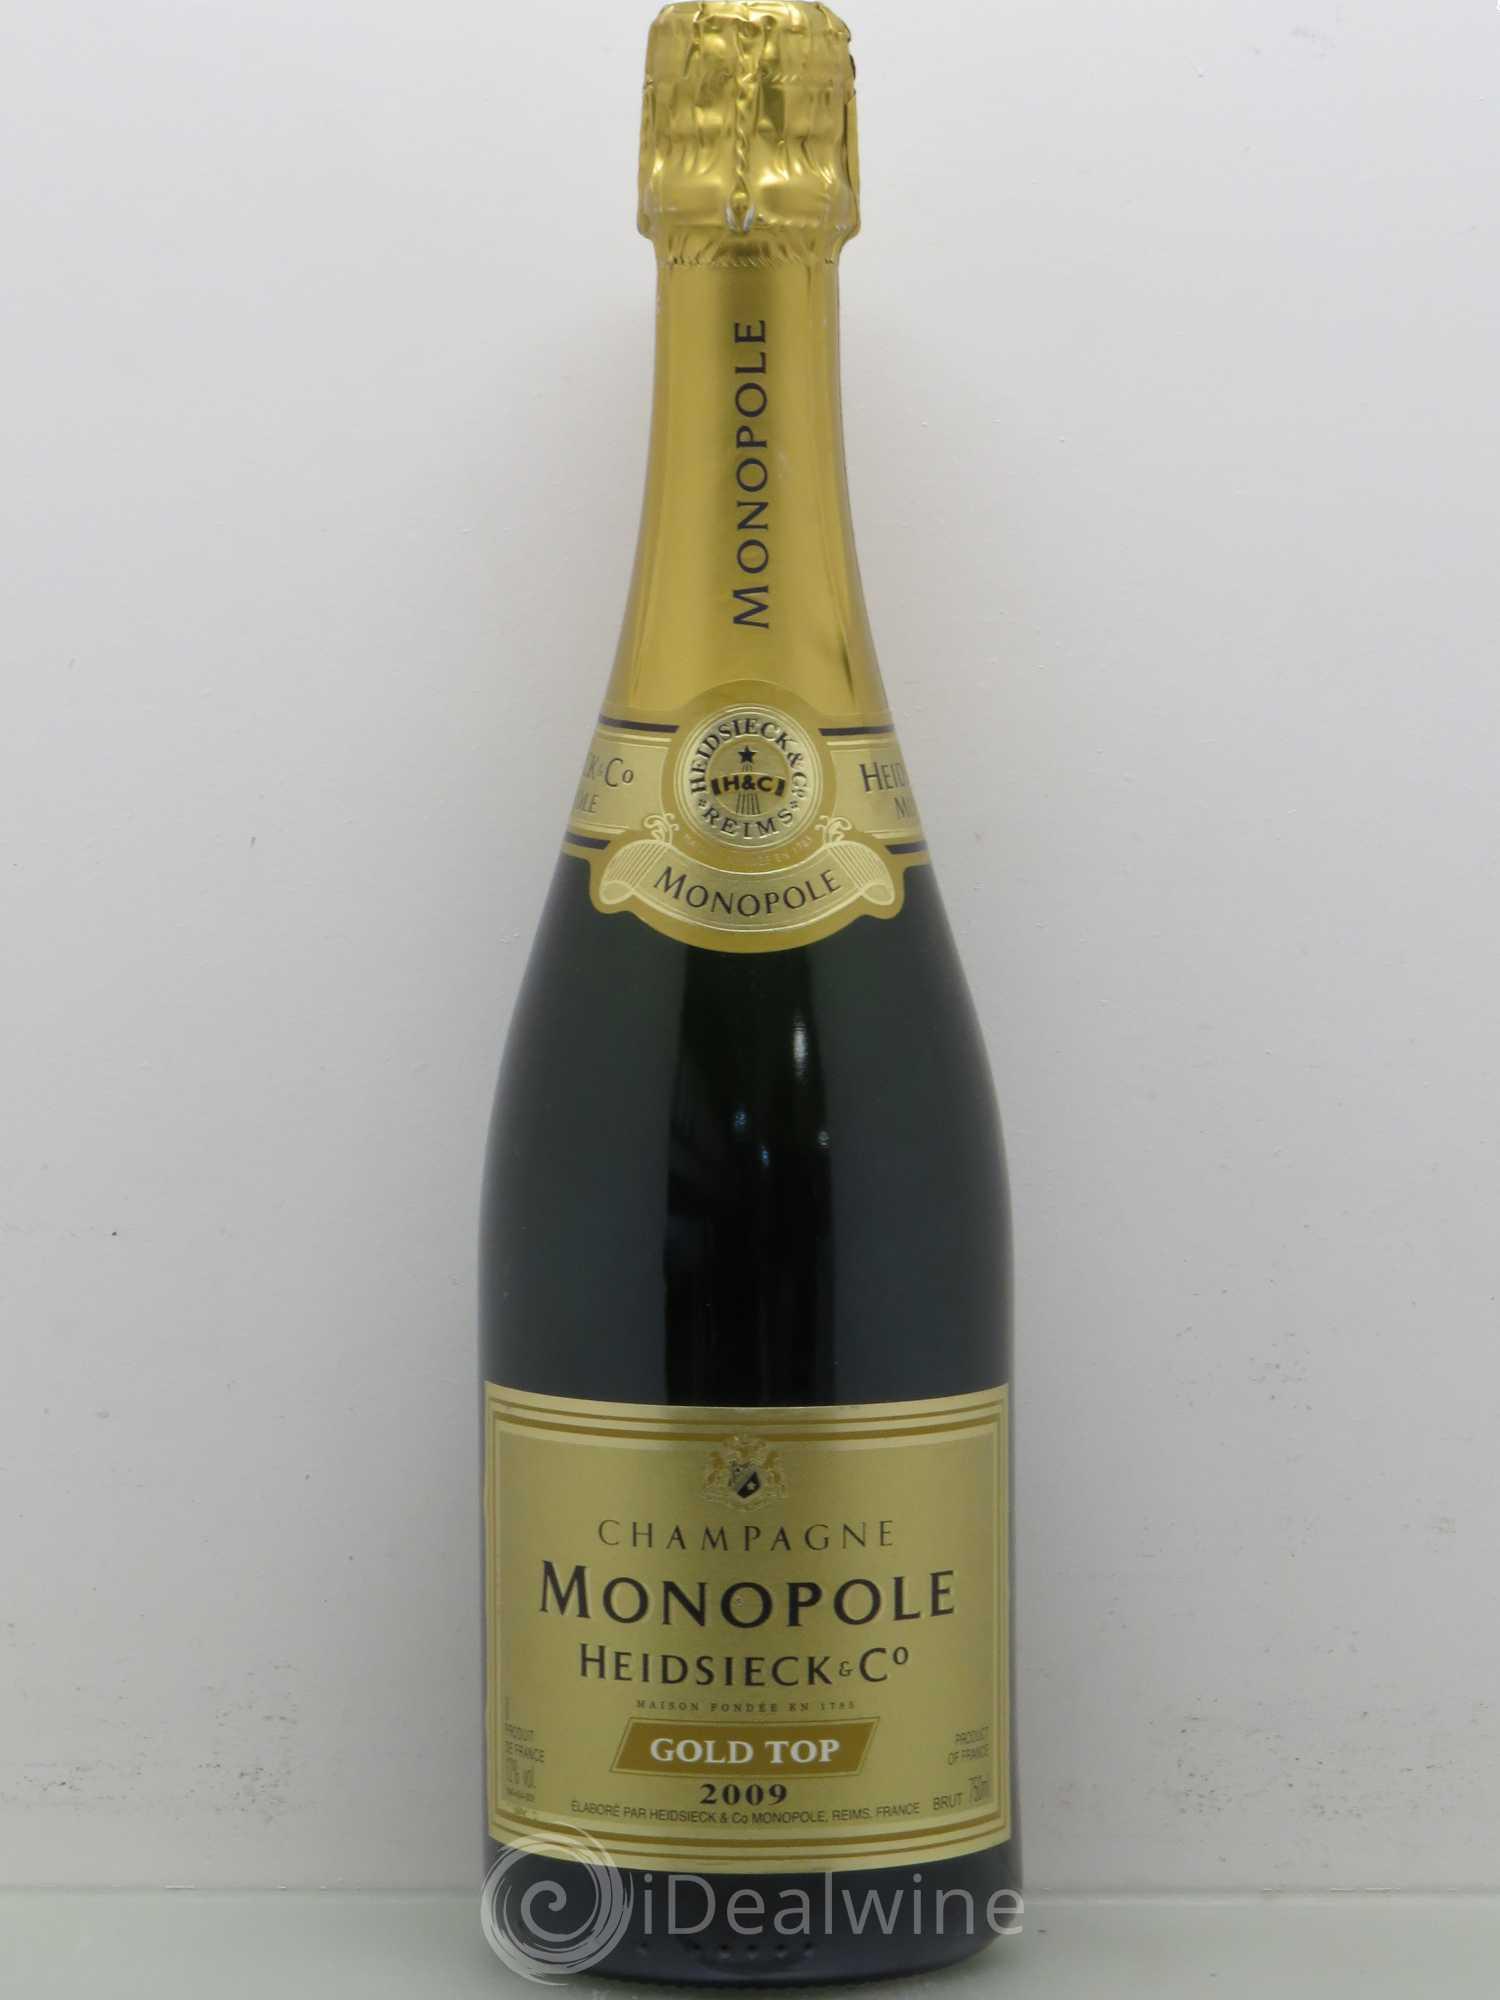 acheter brut champagne heidsieck monopole gold top sans prix de r serve 2009 lot 2607. Black Bedroom Furniture Sets. Home Design Ideas